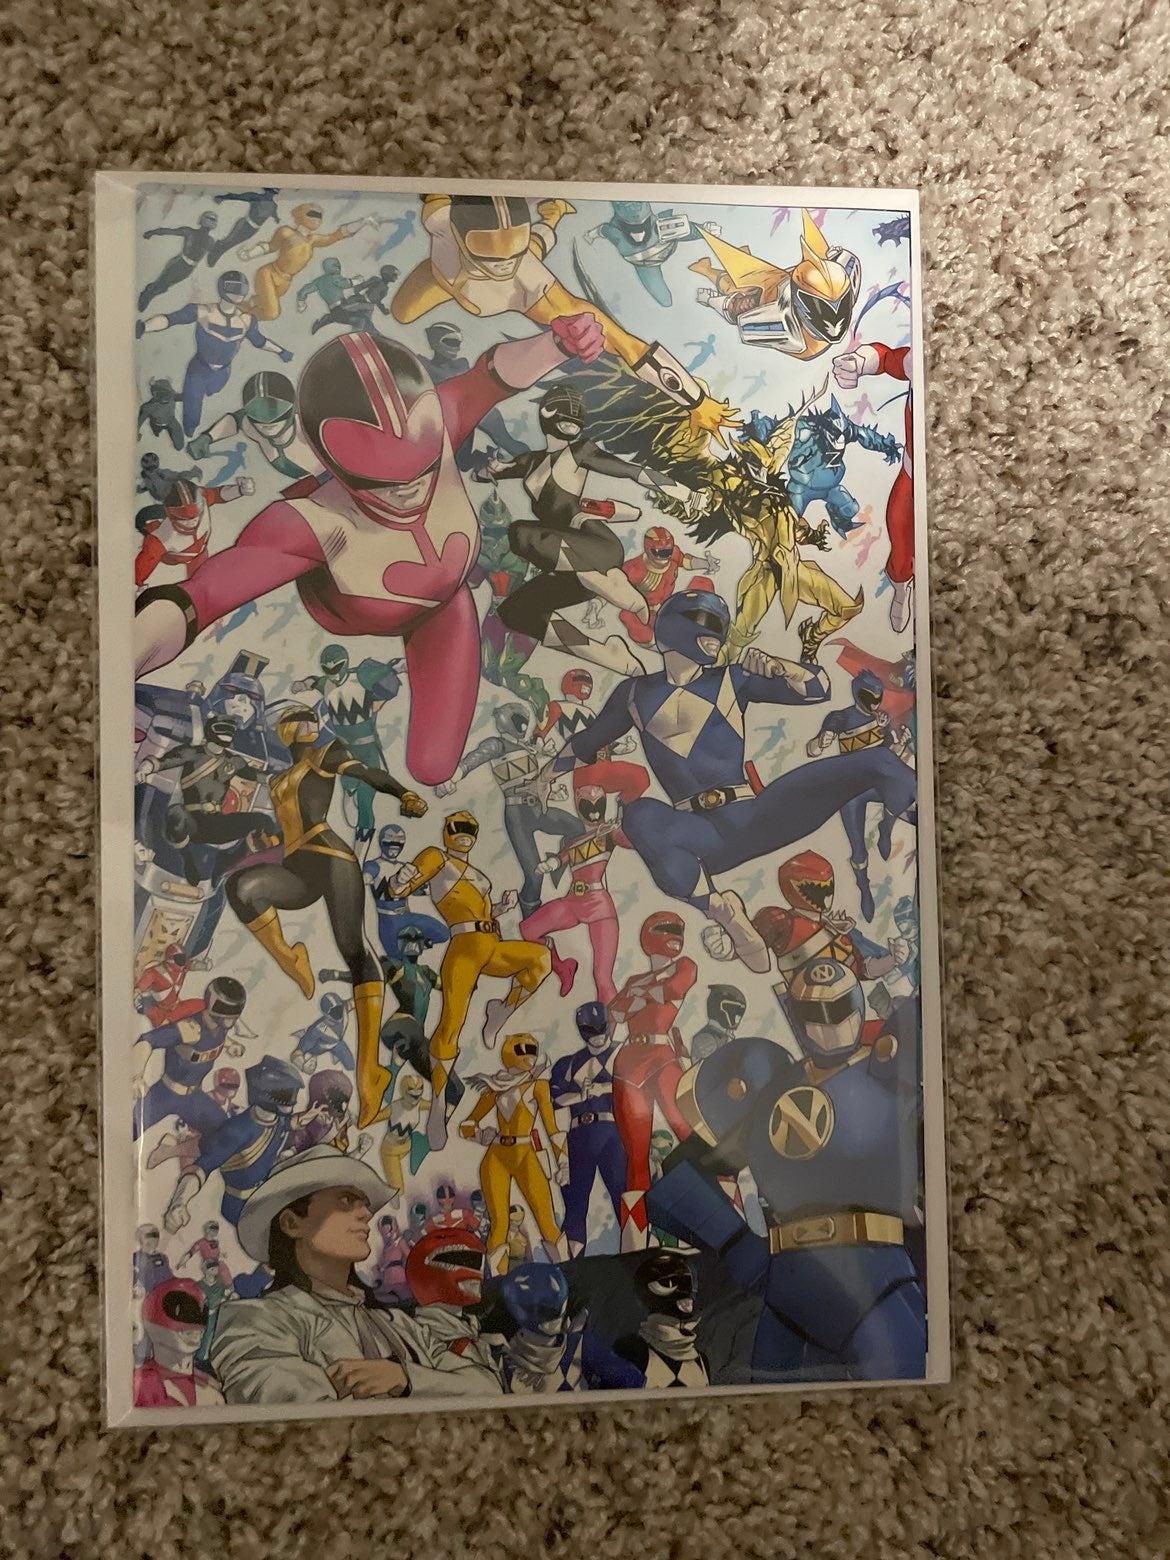 Mighty Morphin 1 2 Power Rangers 1 2 Mor